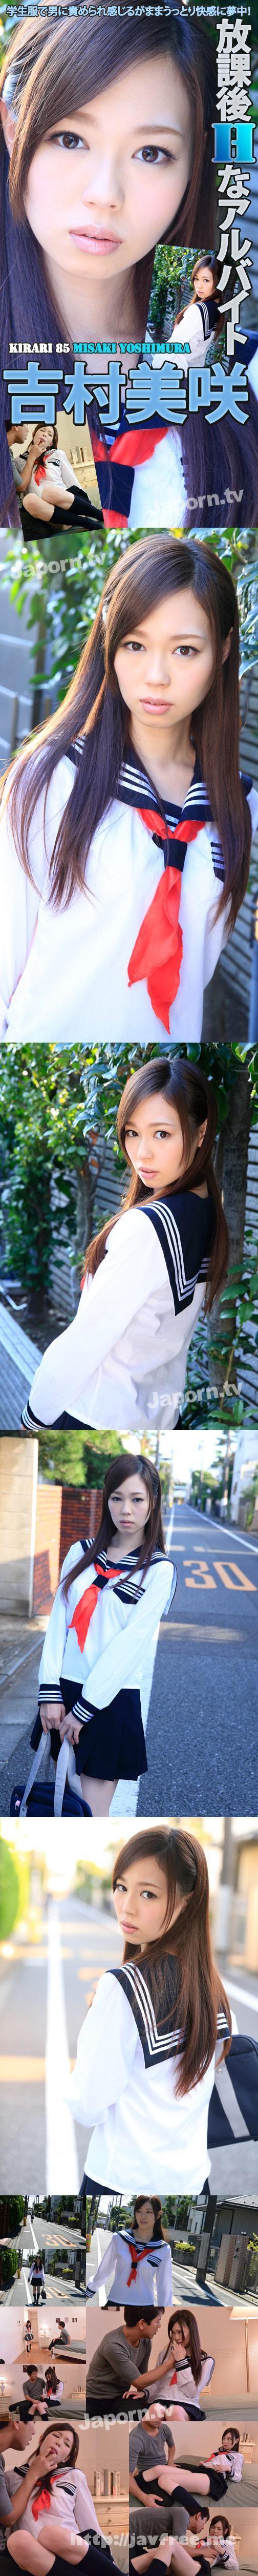 [MKD S85] KIRARI 85 放課後Hなアルバイト : 吉村美咲 吉村美咲 MKD Misaki Yoshimura